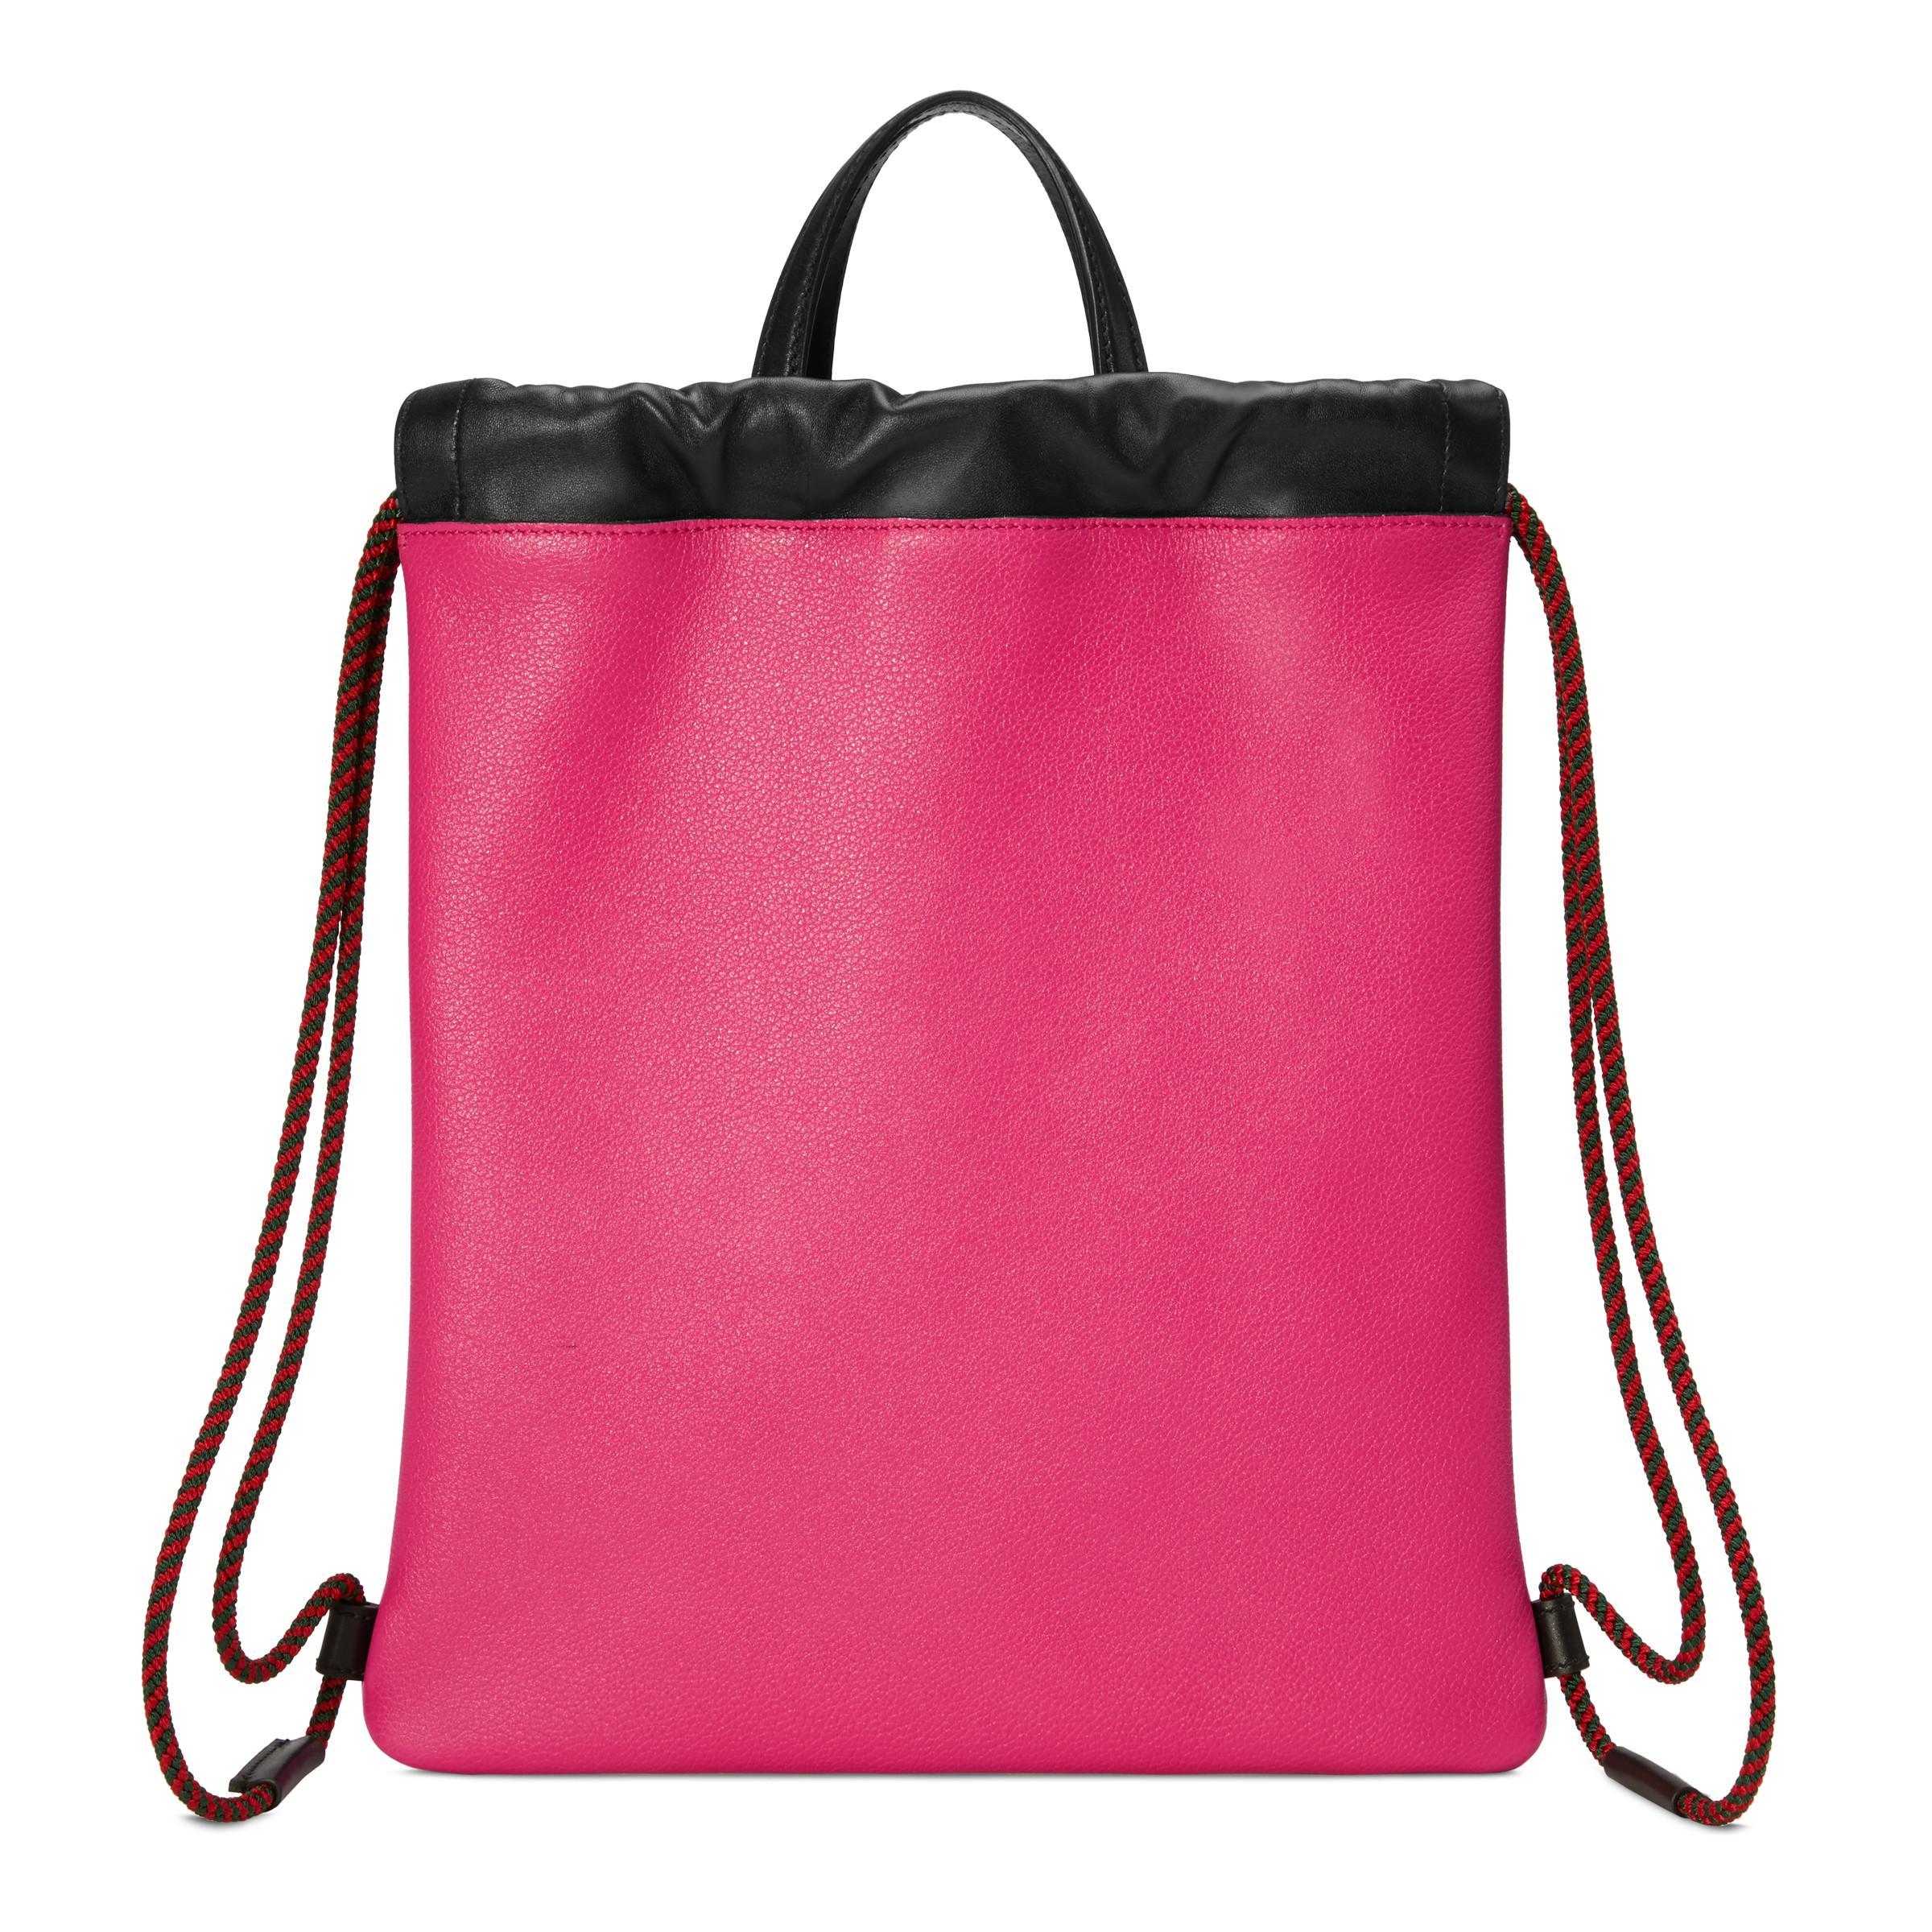 1e1138de06be Gucci - Pink Print Small Drawstring Backpack - Lyst. View fullscreen